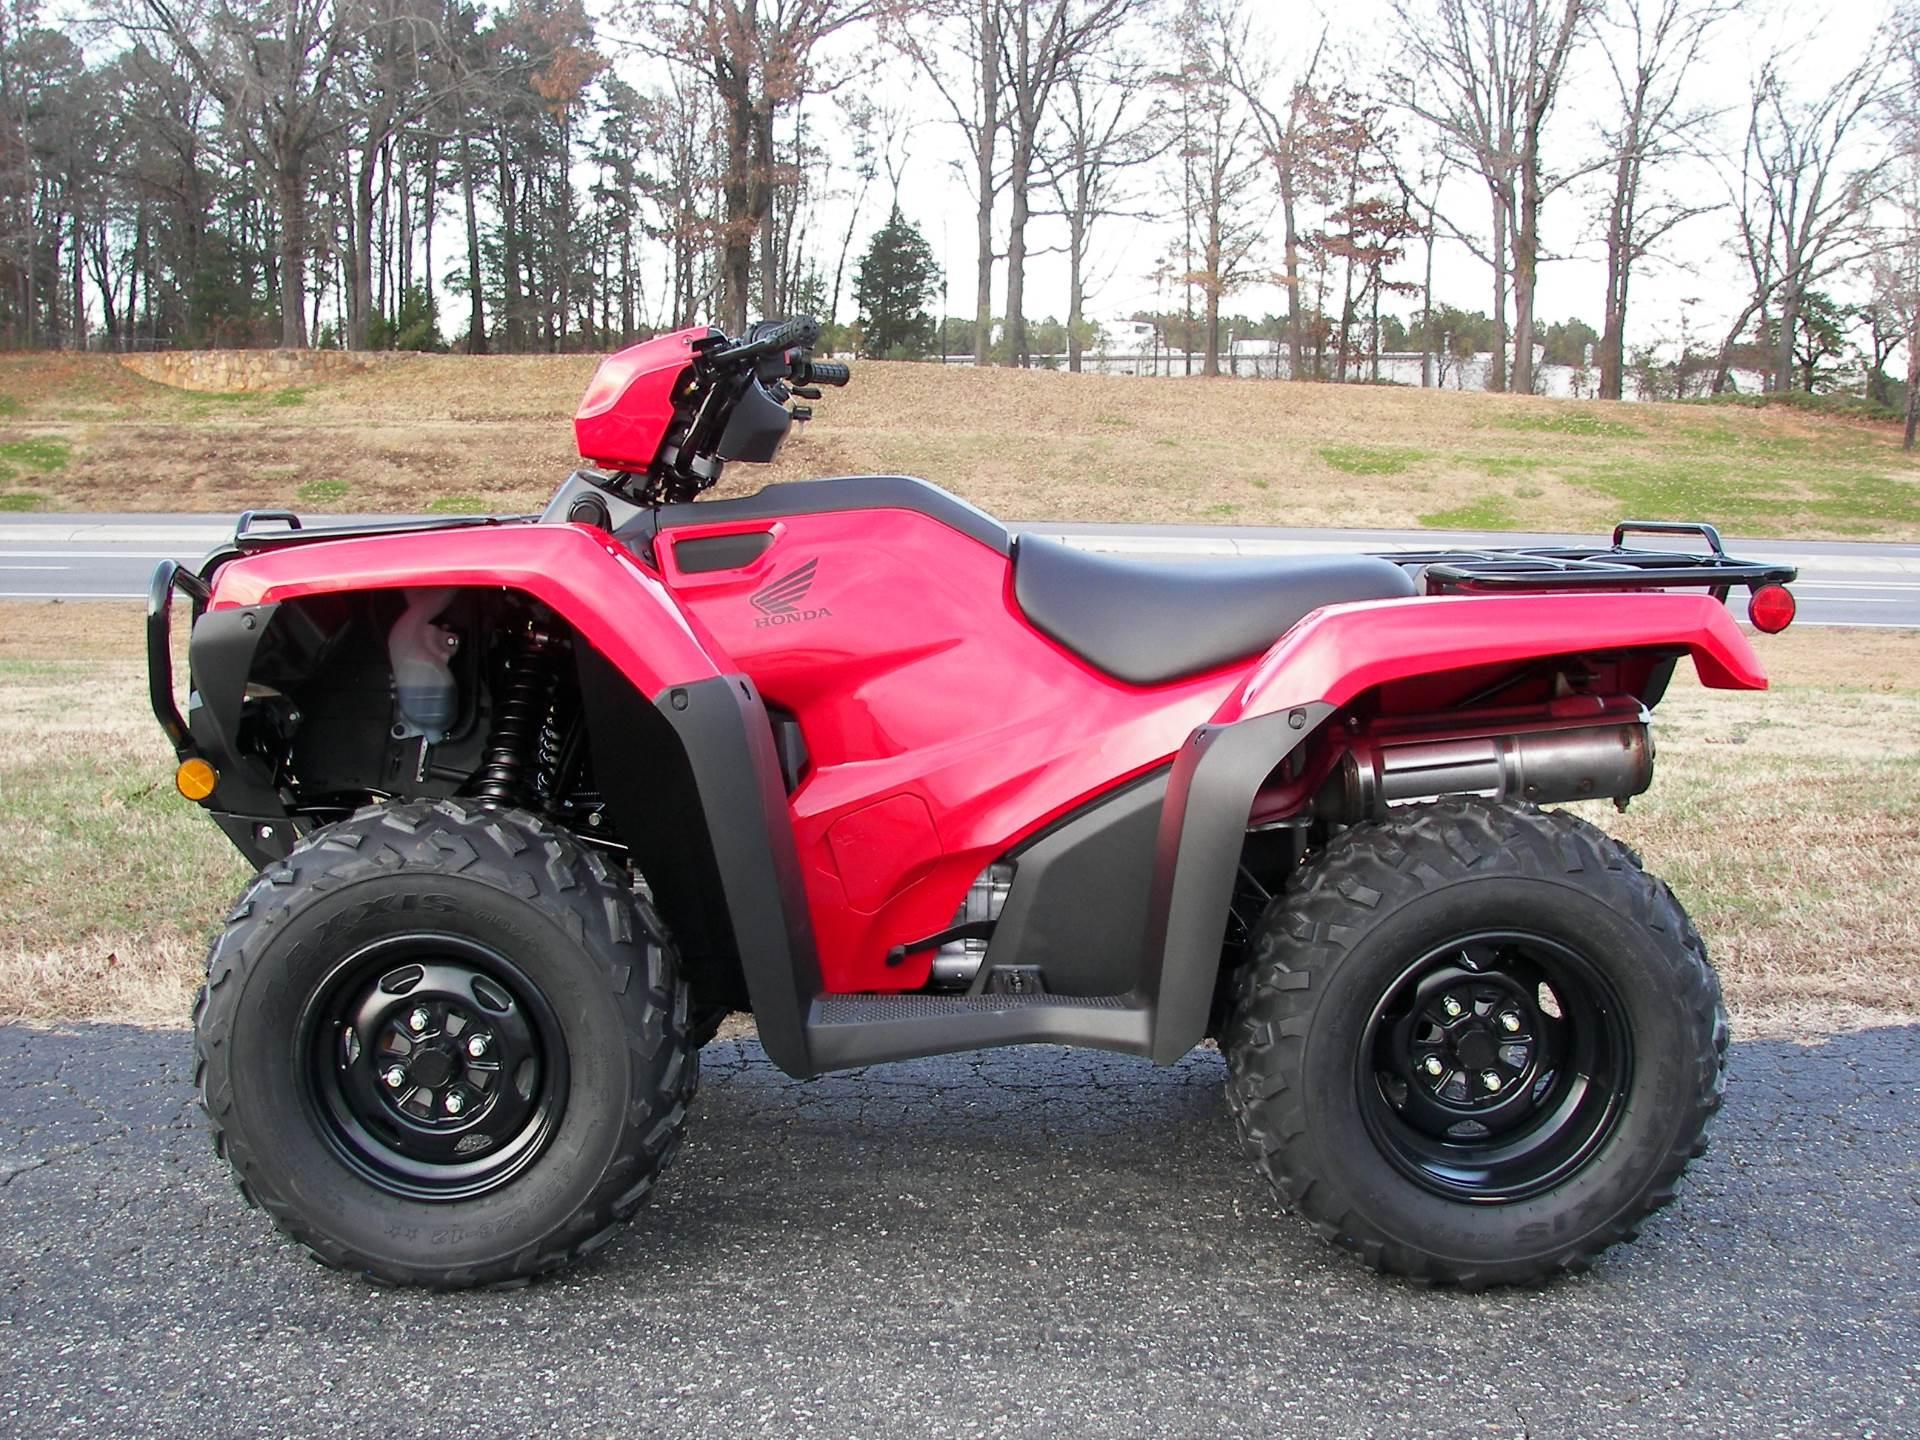 2019 Honda FourTrax Foreman 4x4 in Shelby, North Carolina